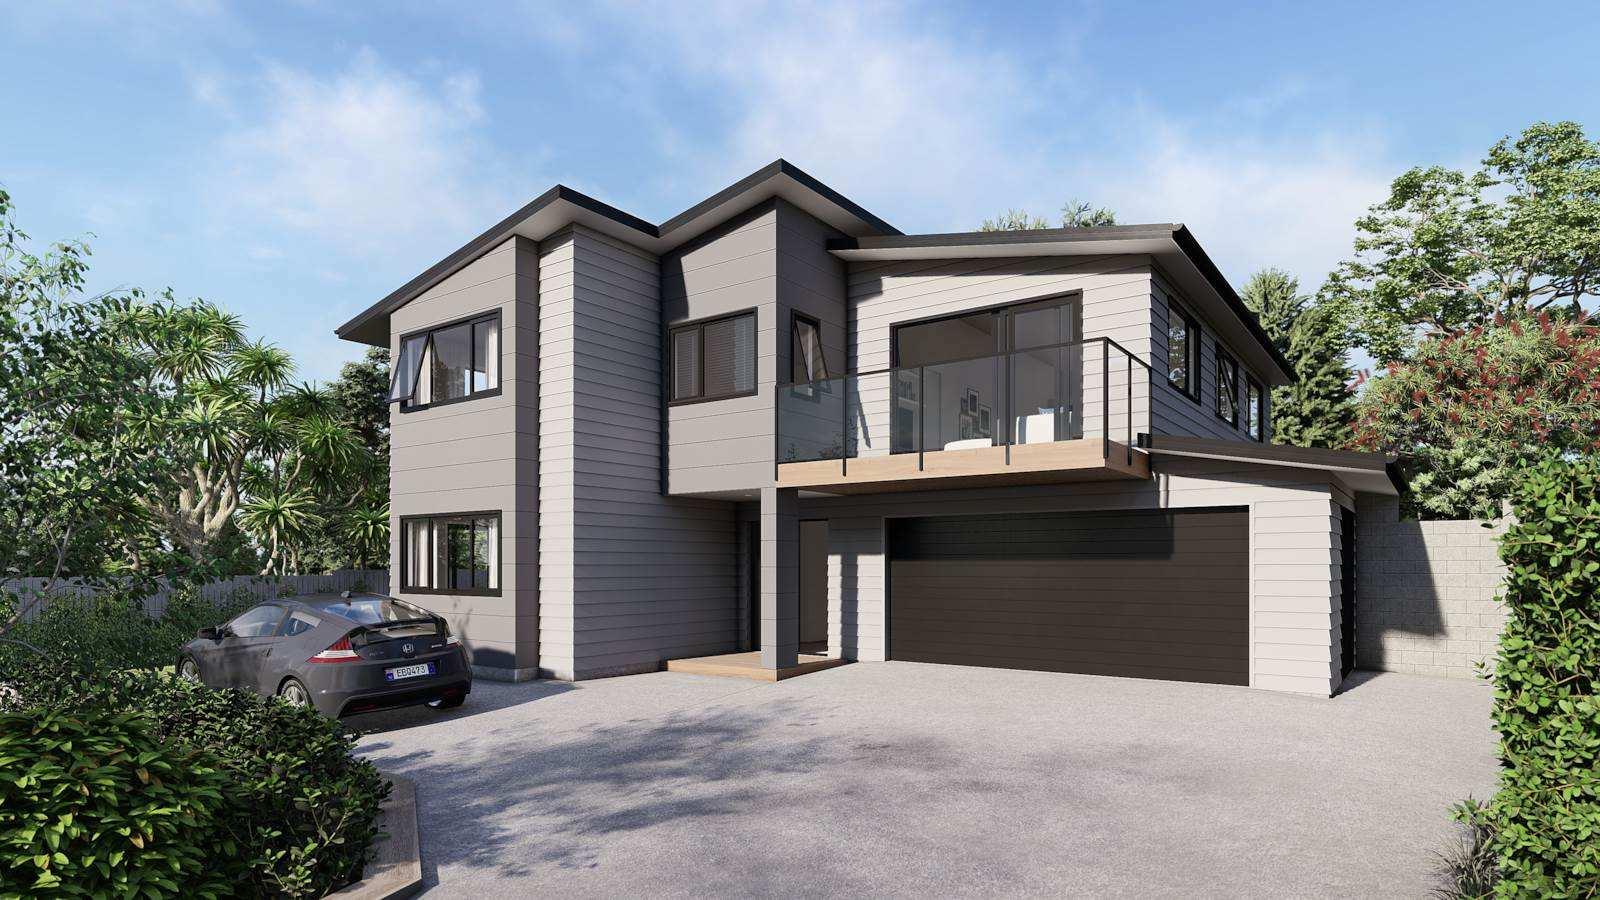 Remuera 3房 全新待建舒宅 好视野优采光 隶属人气双校网 轻松前往CBD 给您一个美好未来! DOUBLE GRAMMAR ZONE - BRAND NEW HOME TO BE BUILT